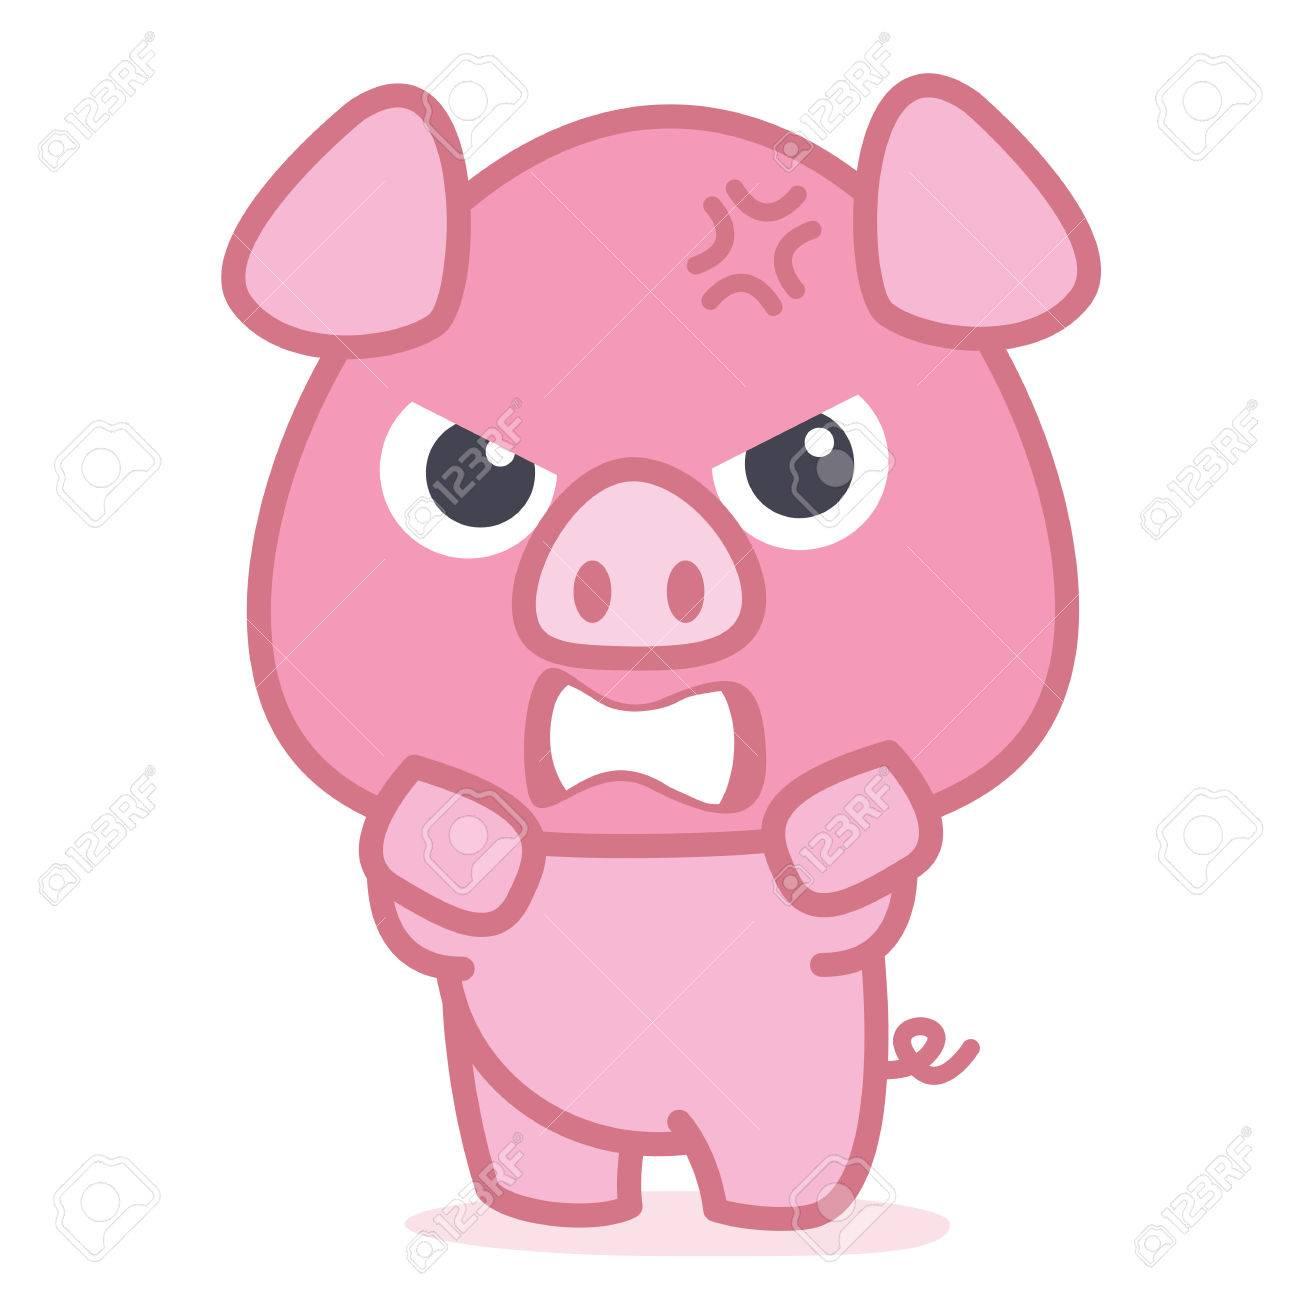 Angry pig cartoon character.